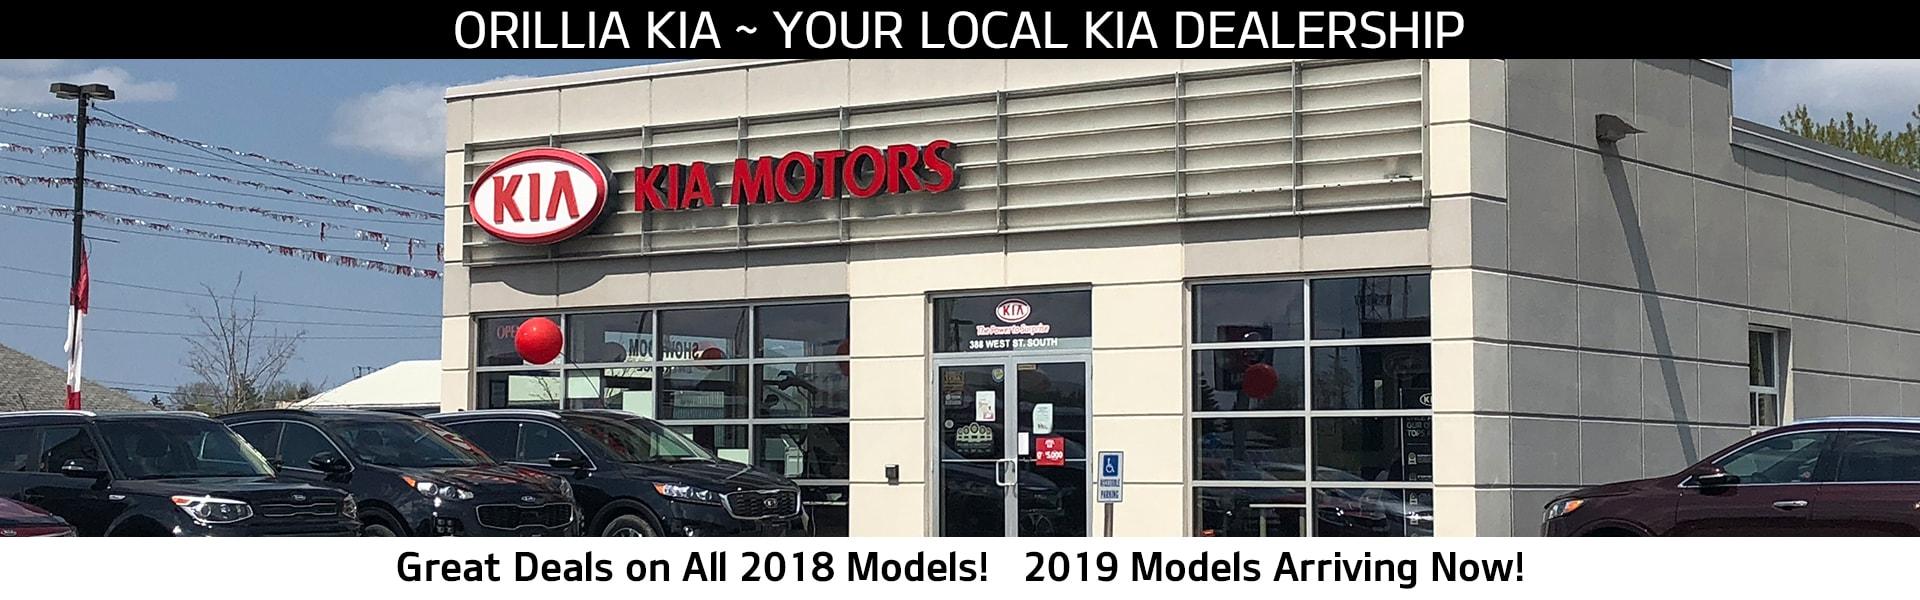 Used Cars Orillia >> Plaza Kia of Orillia: New & Used Kia Dealership   Orillia, ON.